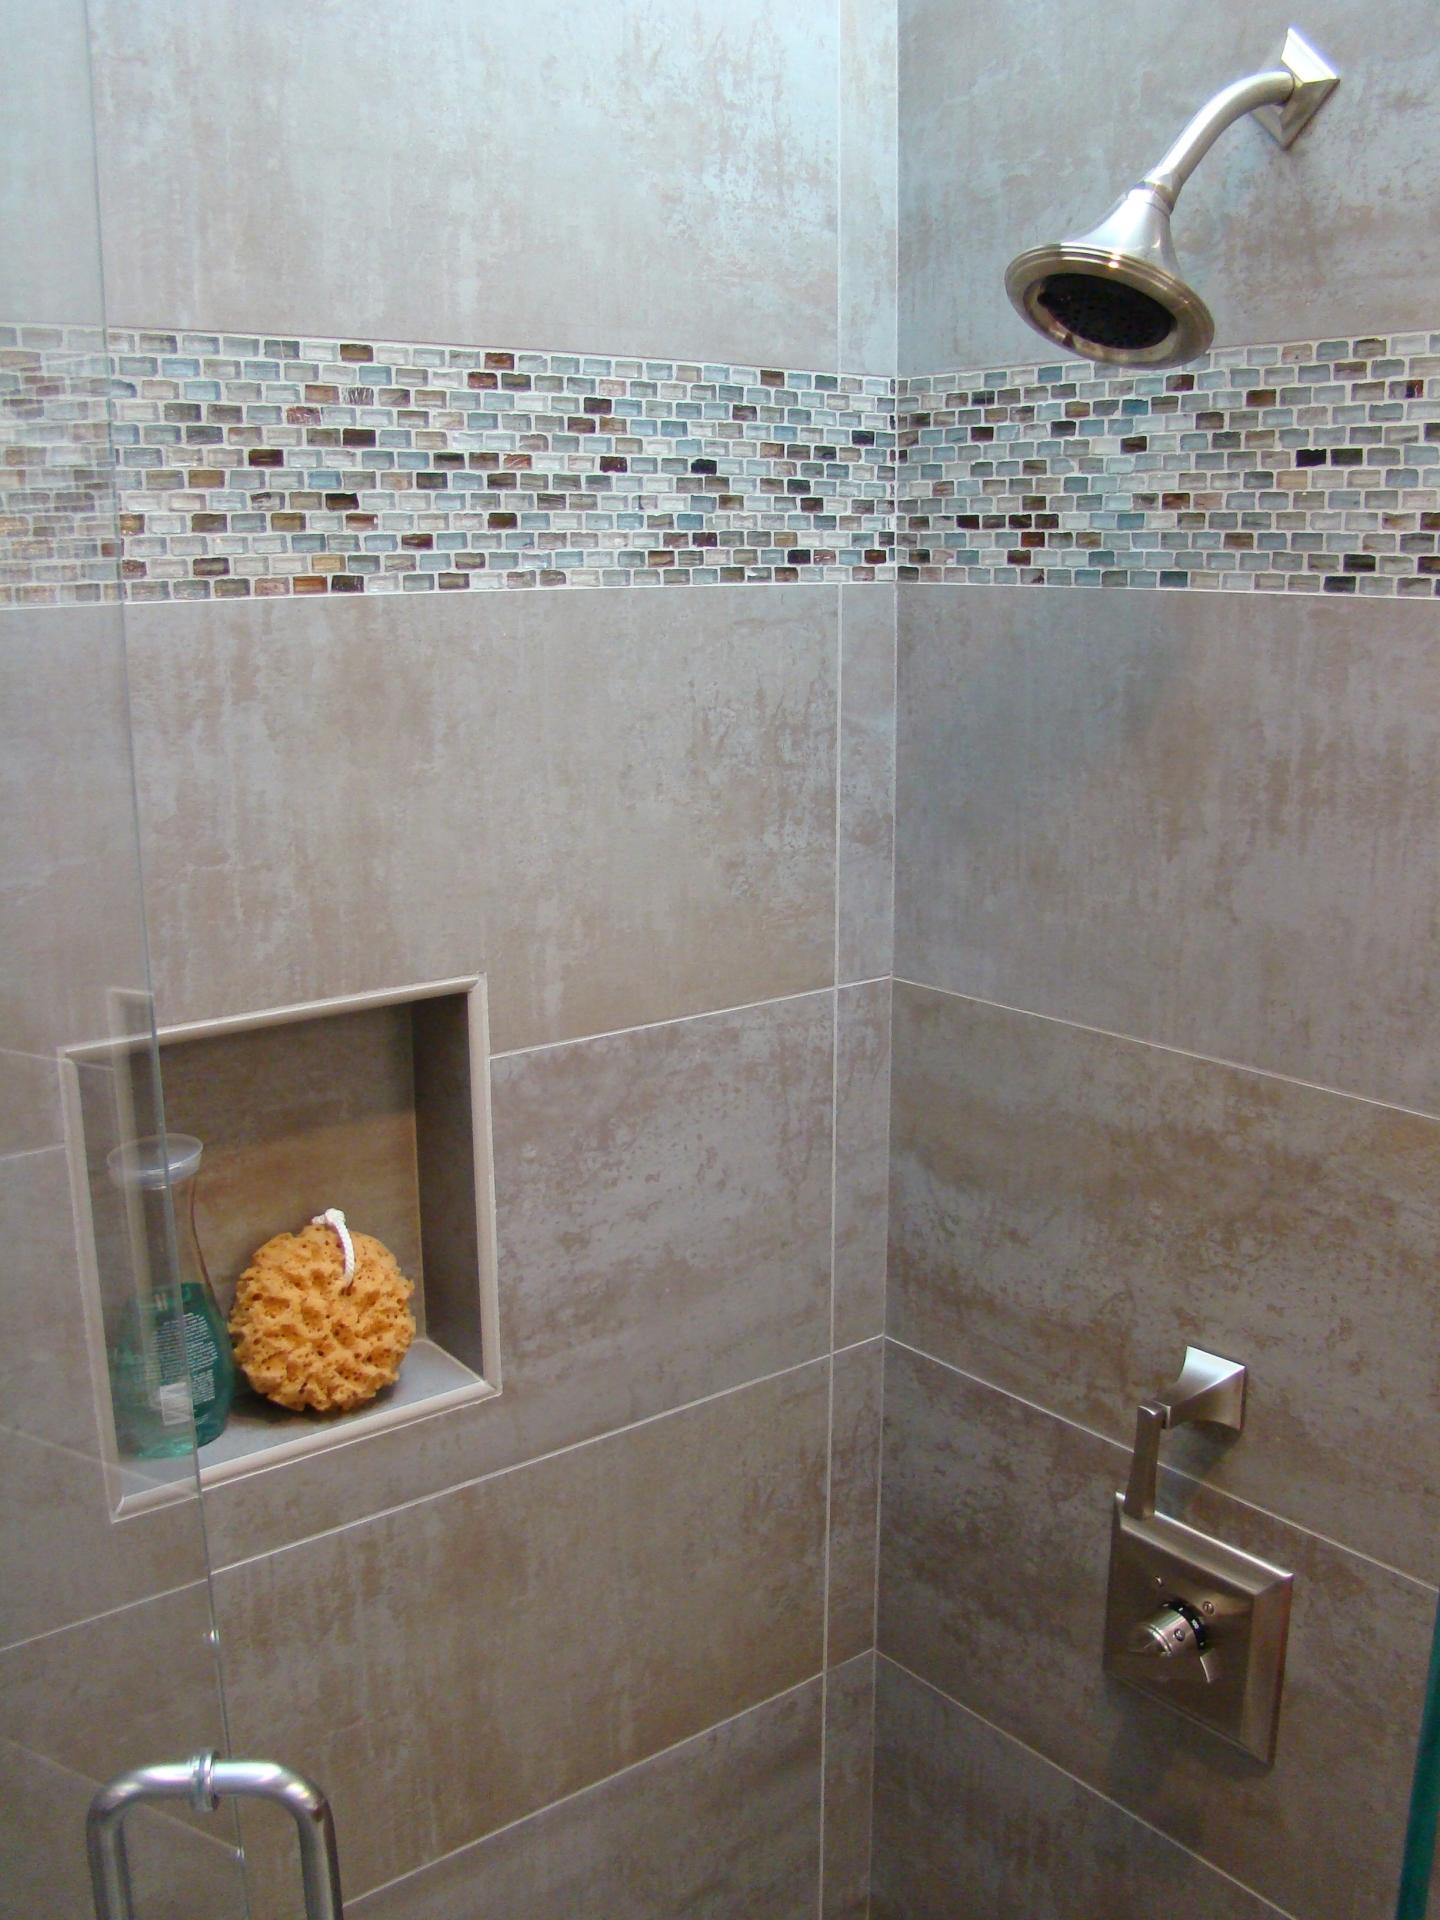 Fiorito Interior Design, interior design, remodel, bathroom, transitional, shower, glass mosaic